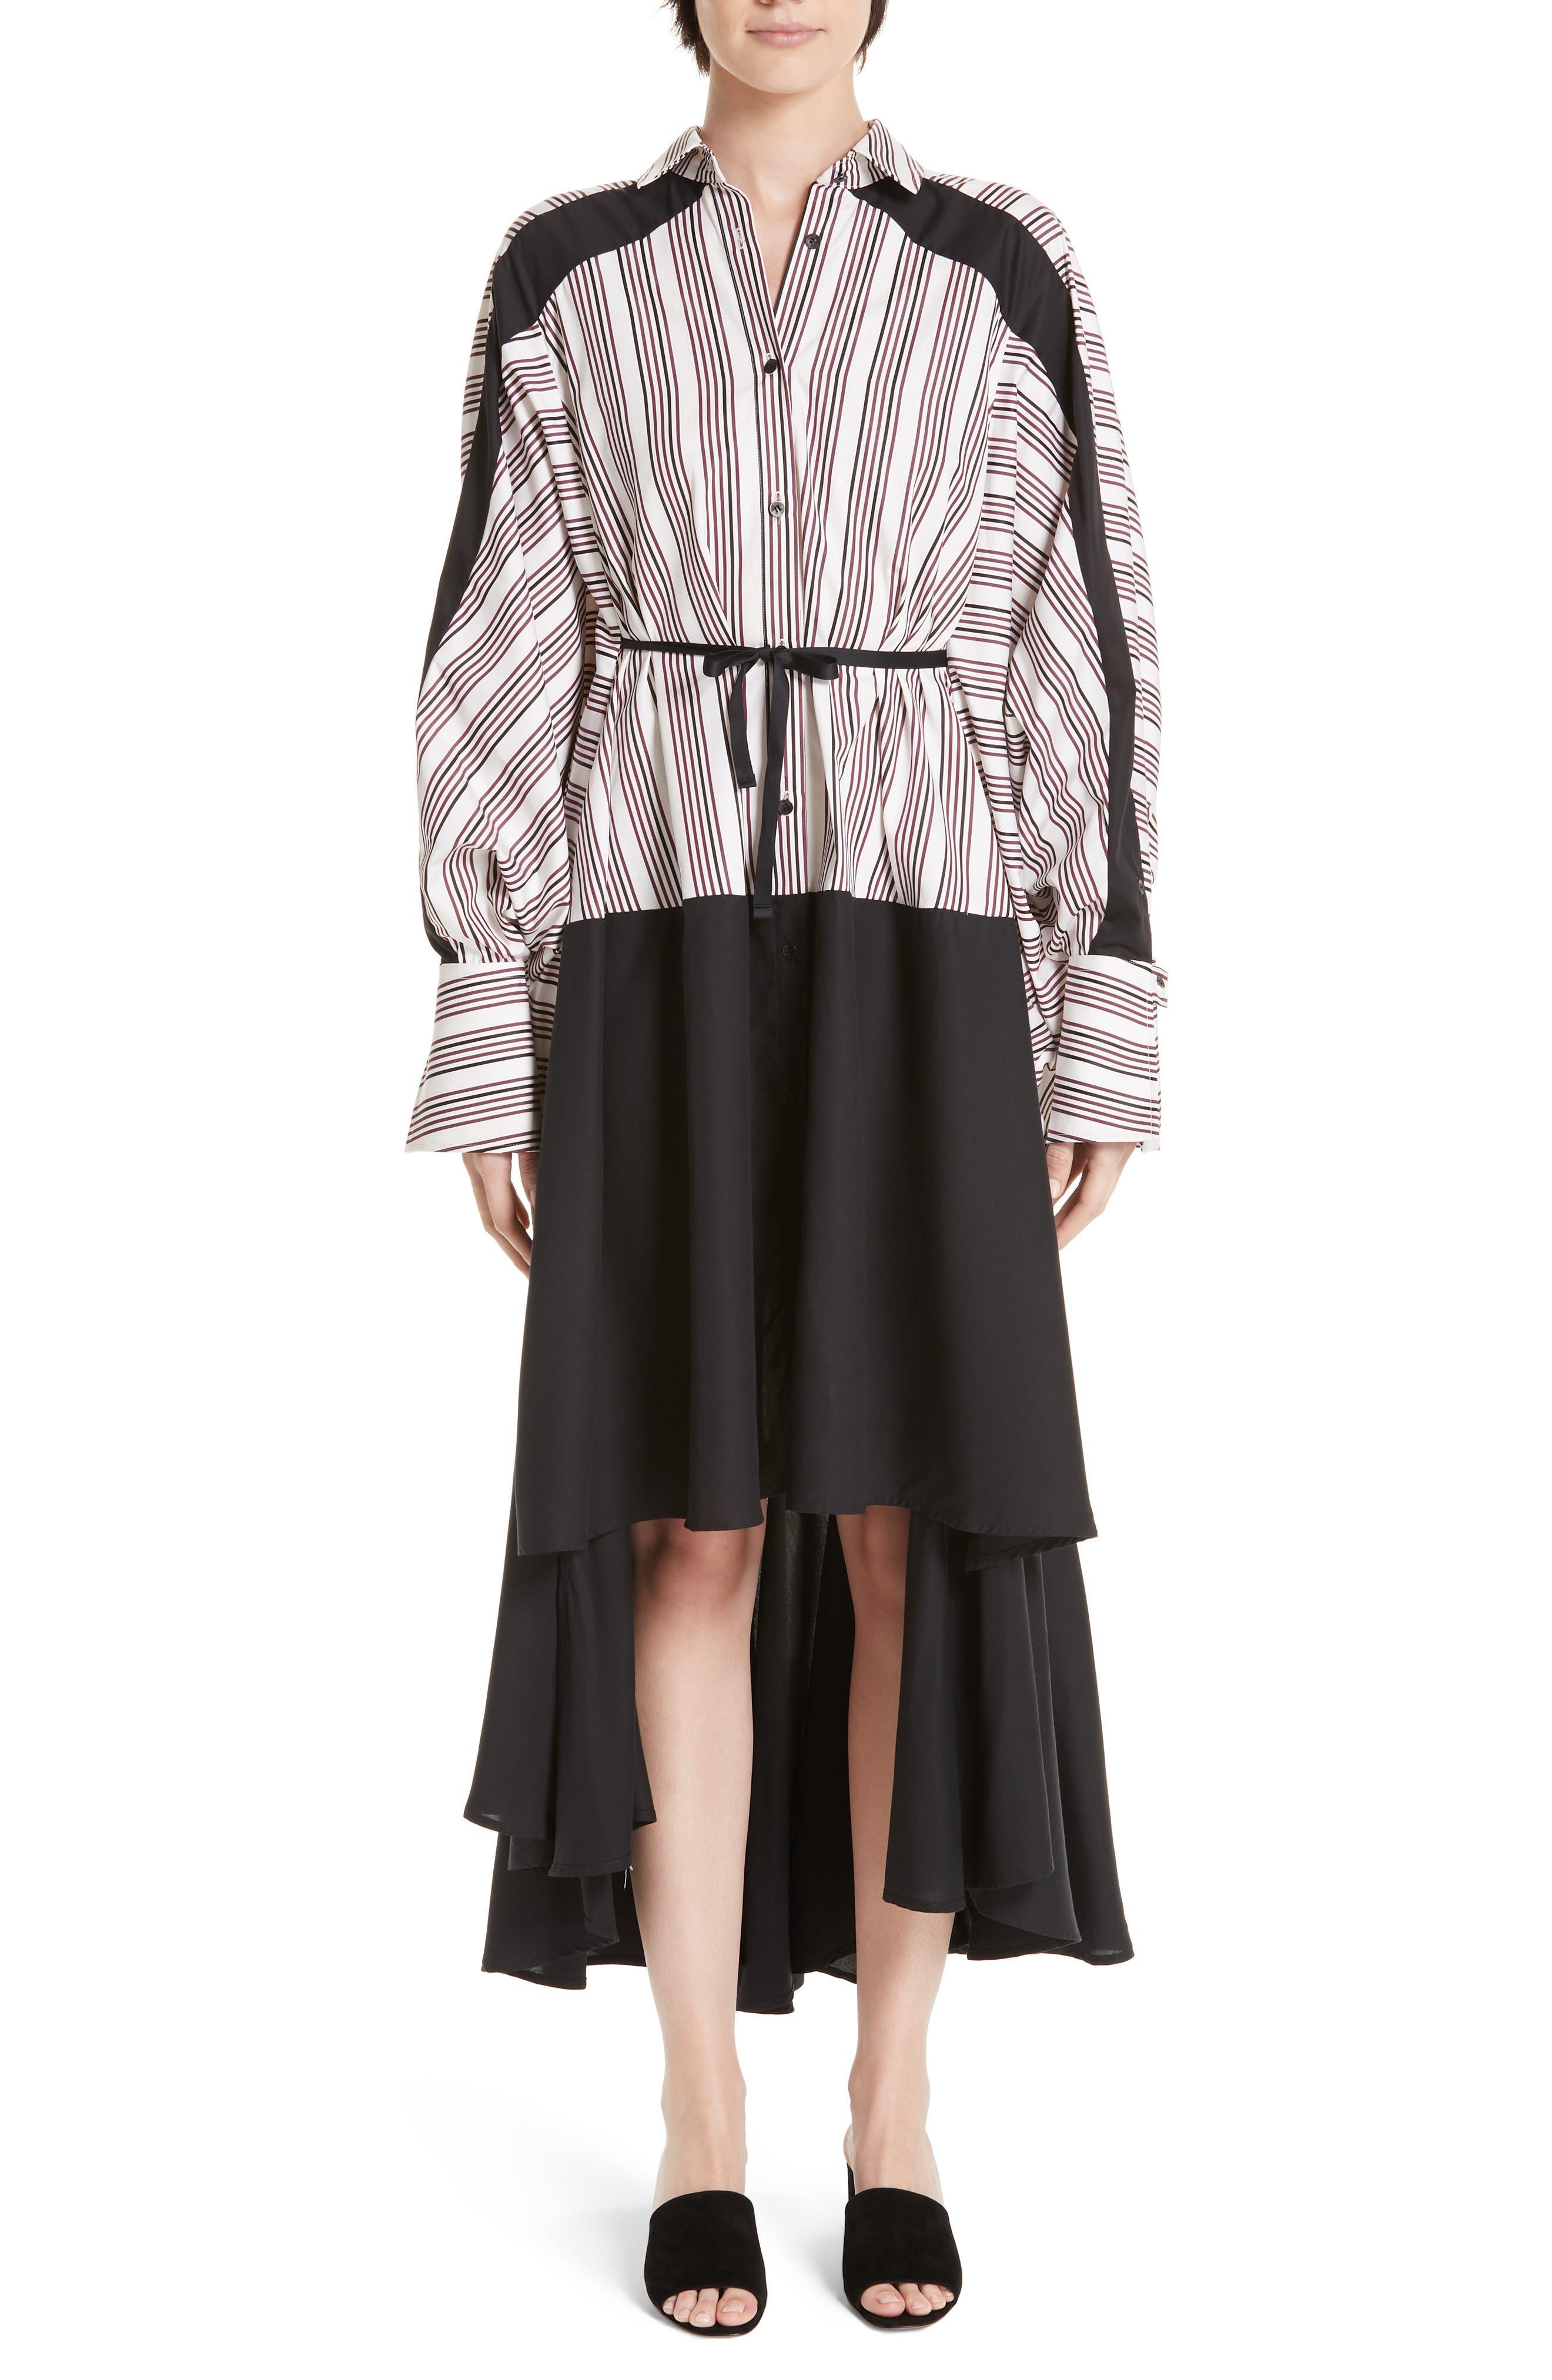 PALMER//HARDING Streep Stripe Shirtdress in Berry Satin Stripe With Black